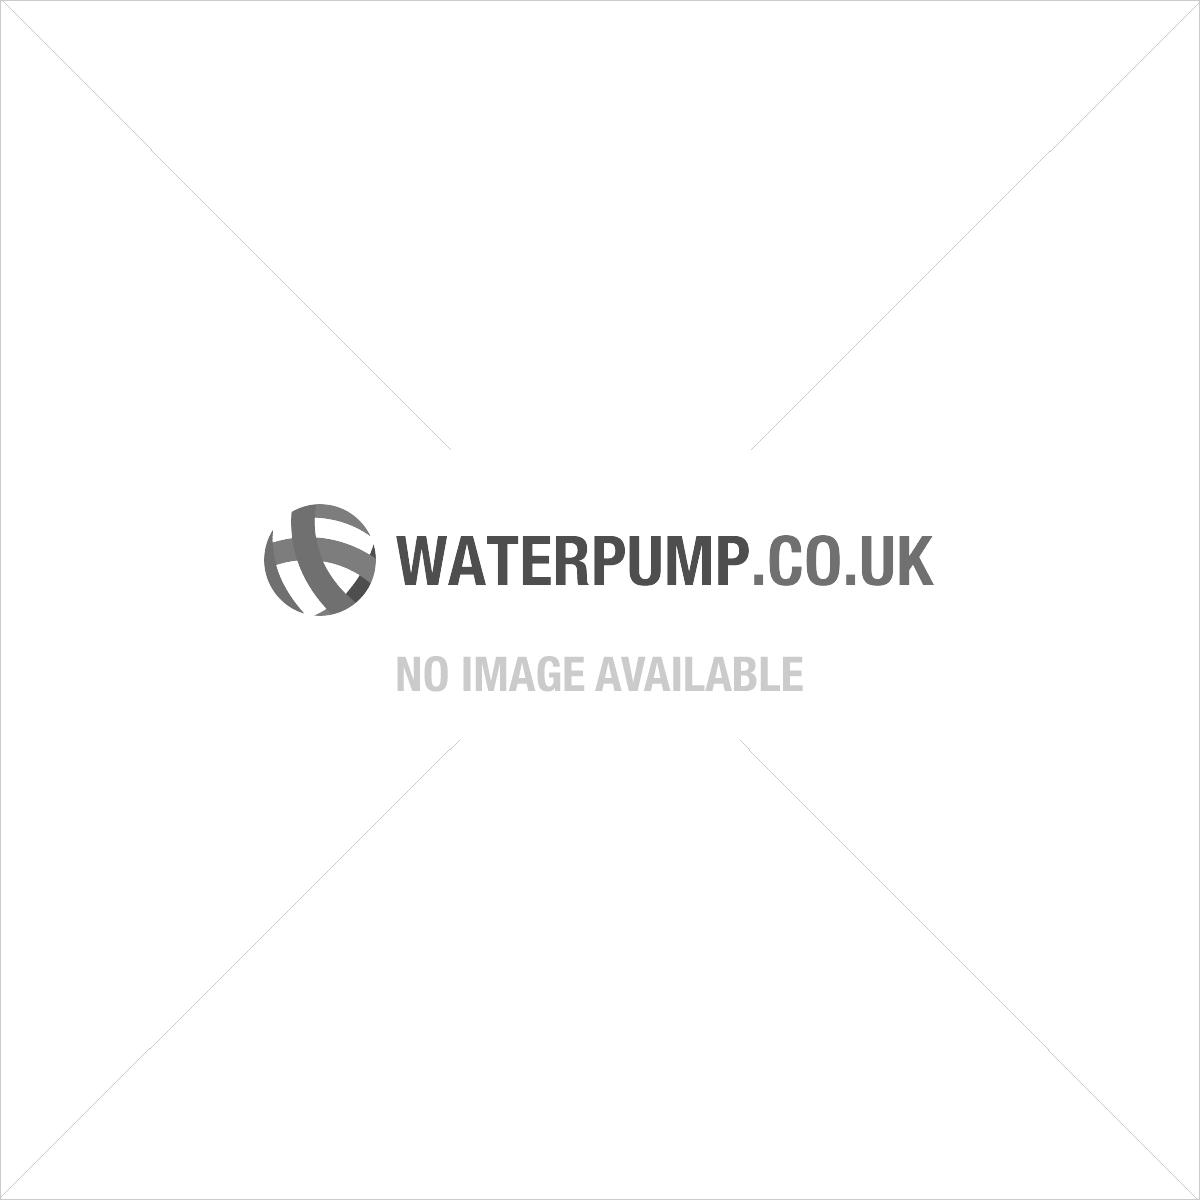 Hose clamp for a 19 mm to 25 mm hose